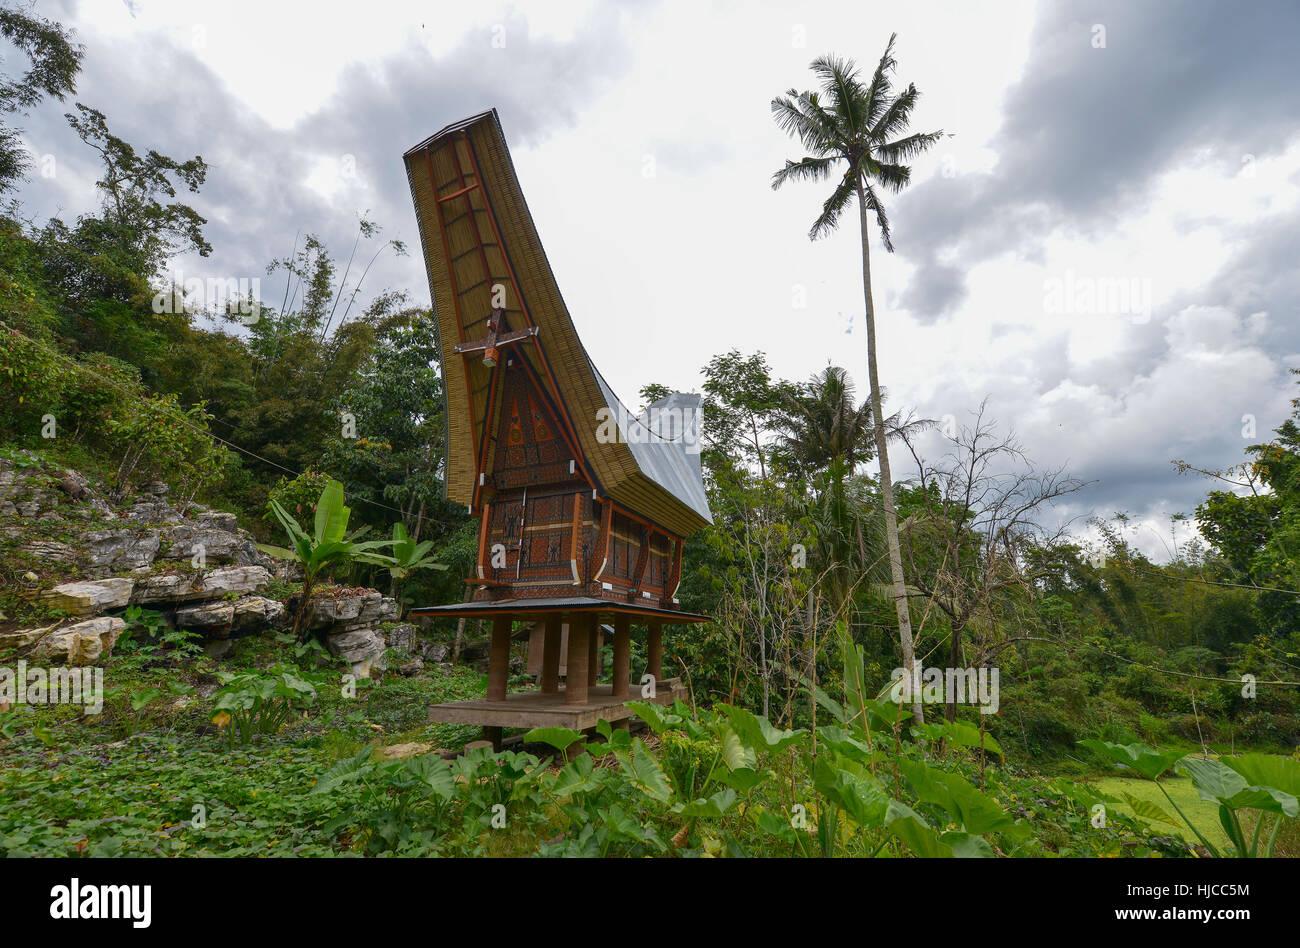 Tongkonan traditional houses in Tana Toraja, Sulawesi, Indonesia - Stock Image